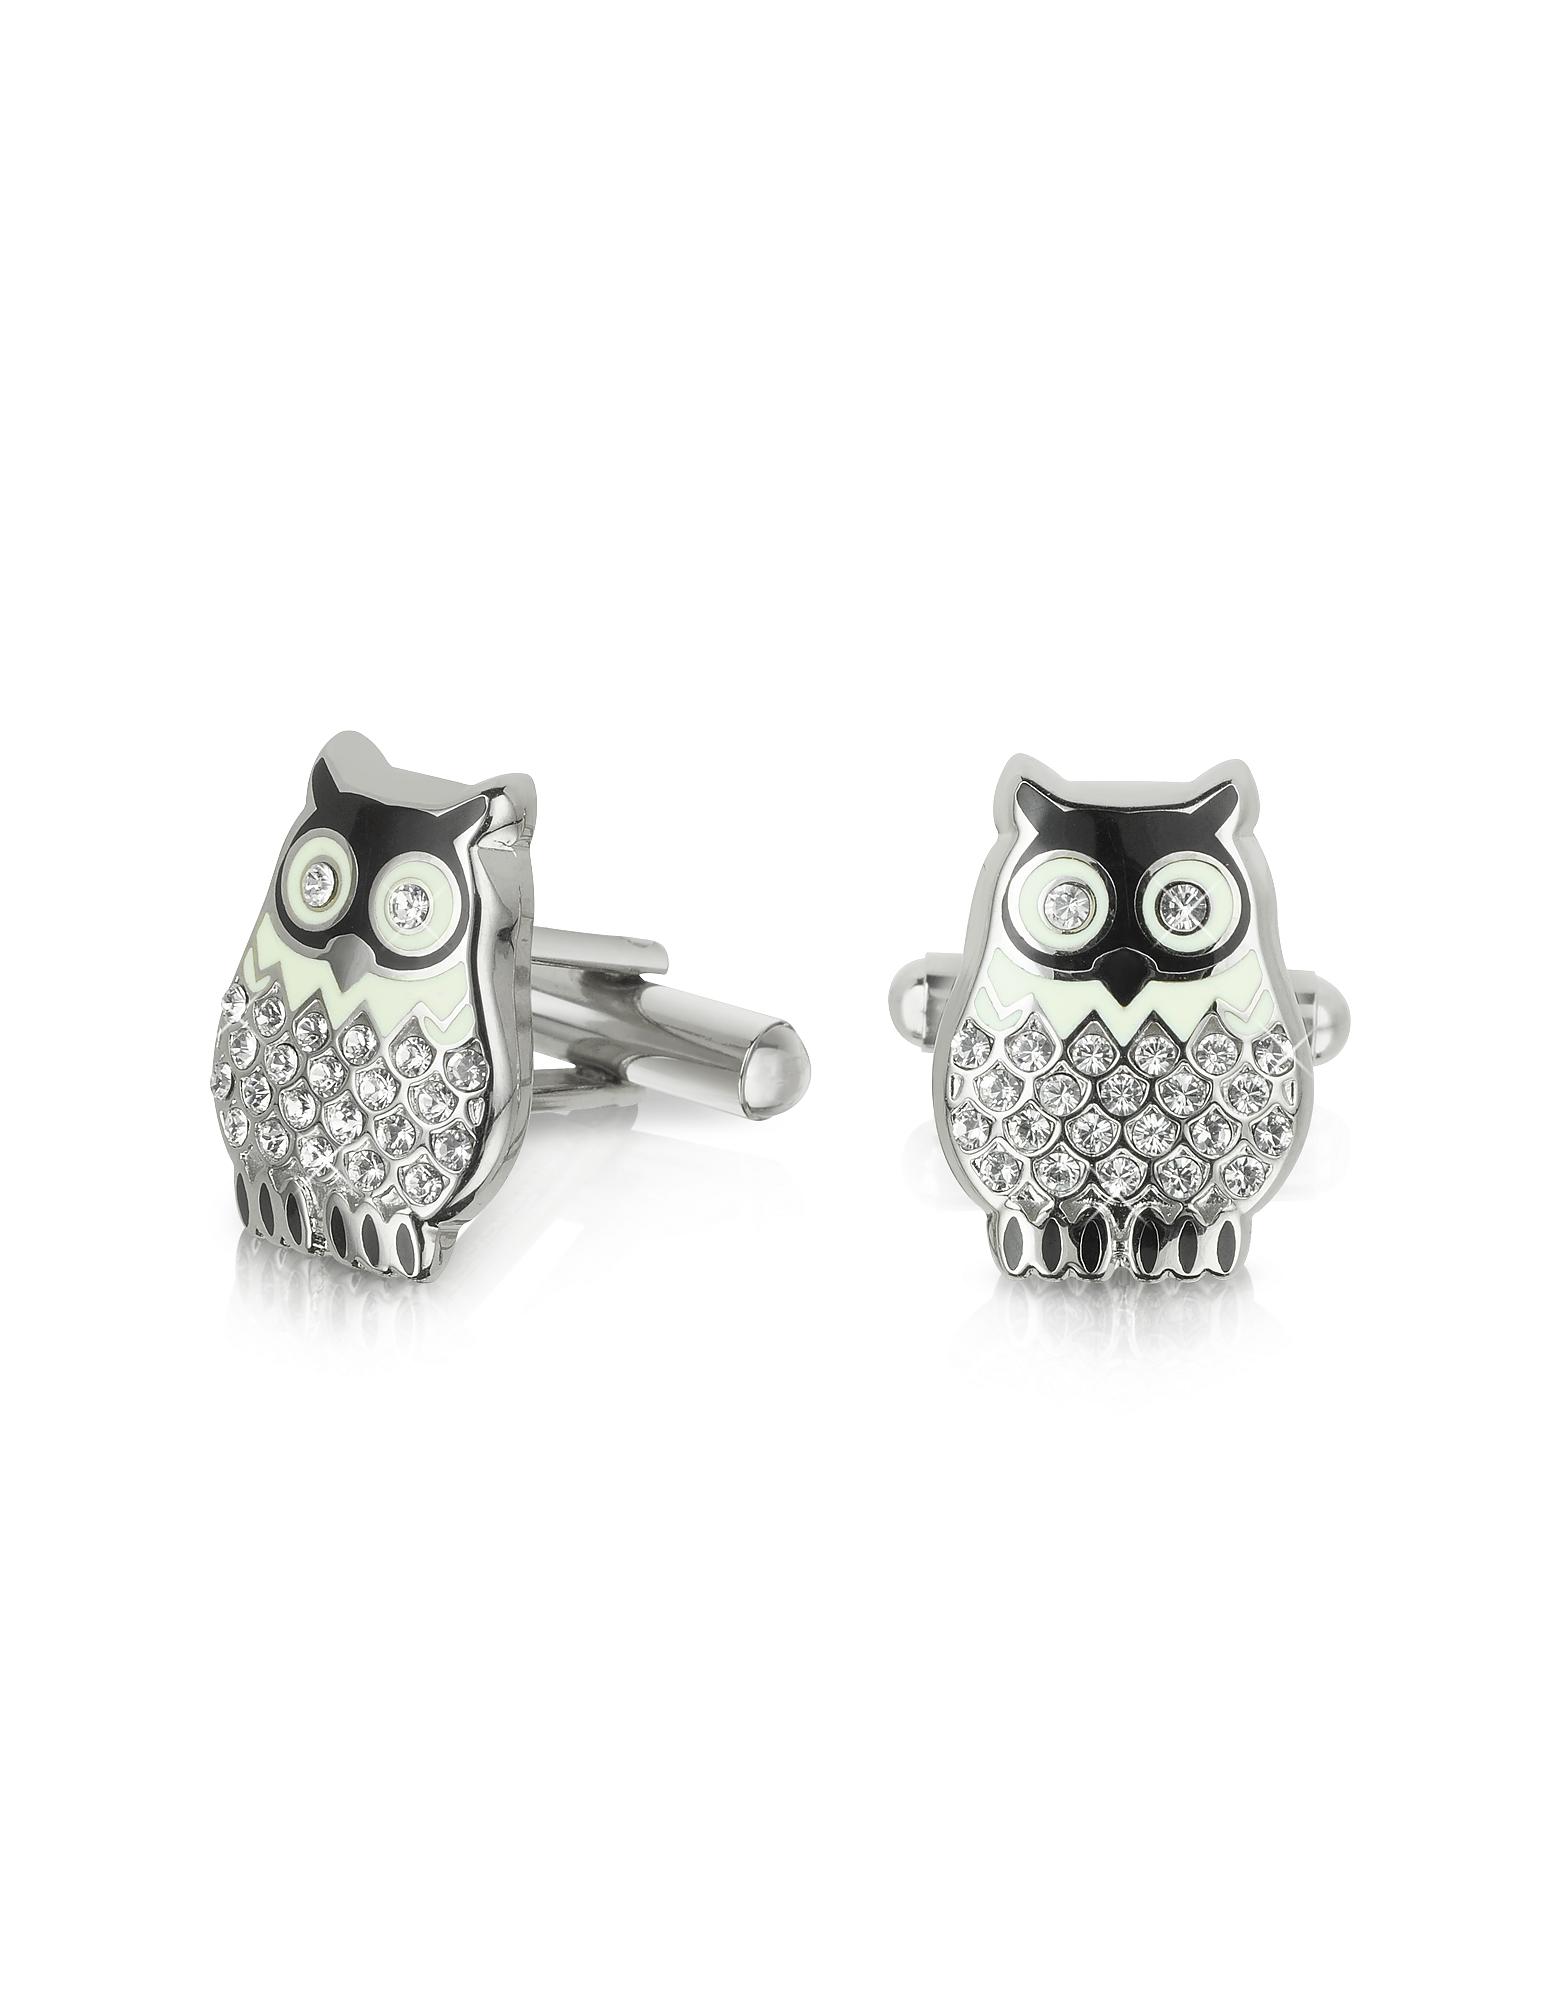 Forzieri Cufflinks, Fashion Garden - Owl Cufflinks